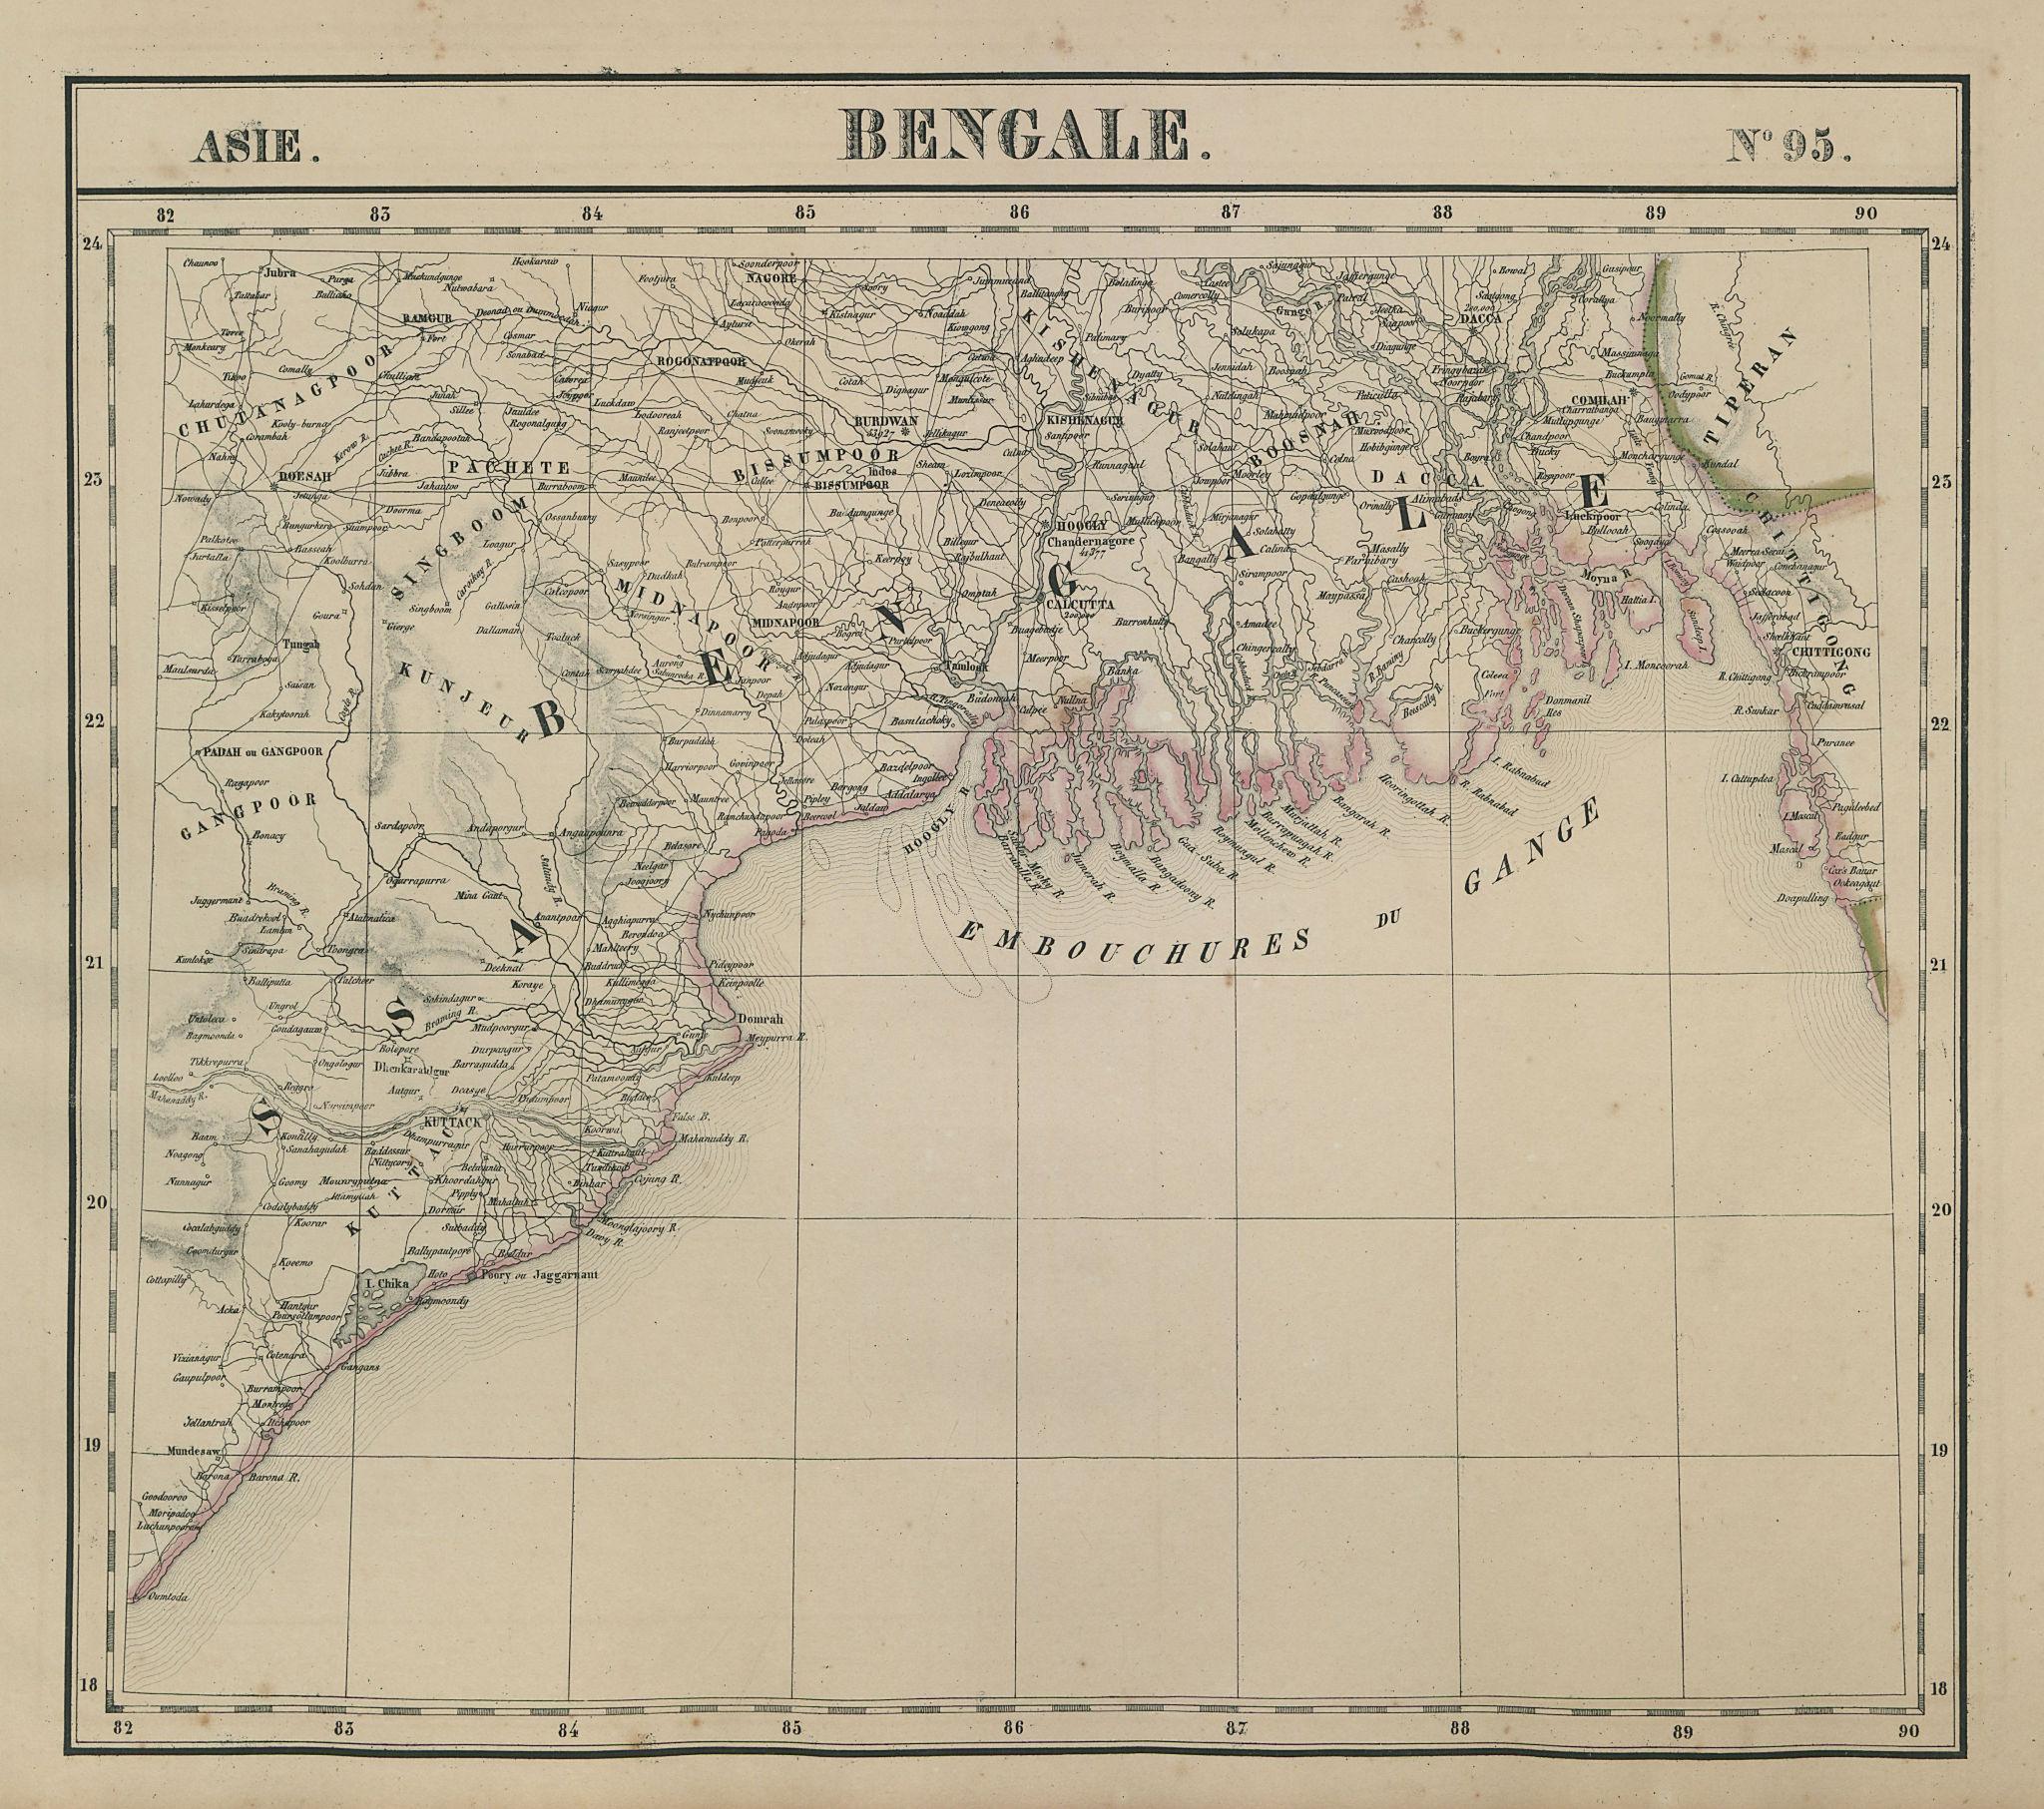 Asie. Bengale #95 Bangladesh West Bengal Odisha India. VANDERMAELEN 1827 map